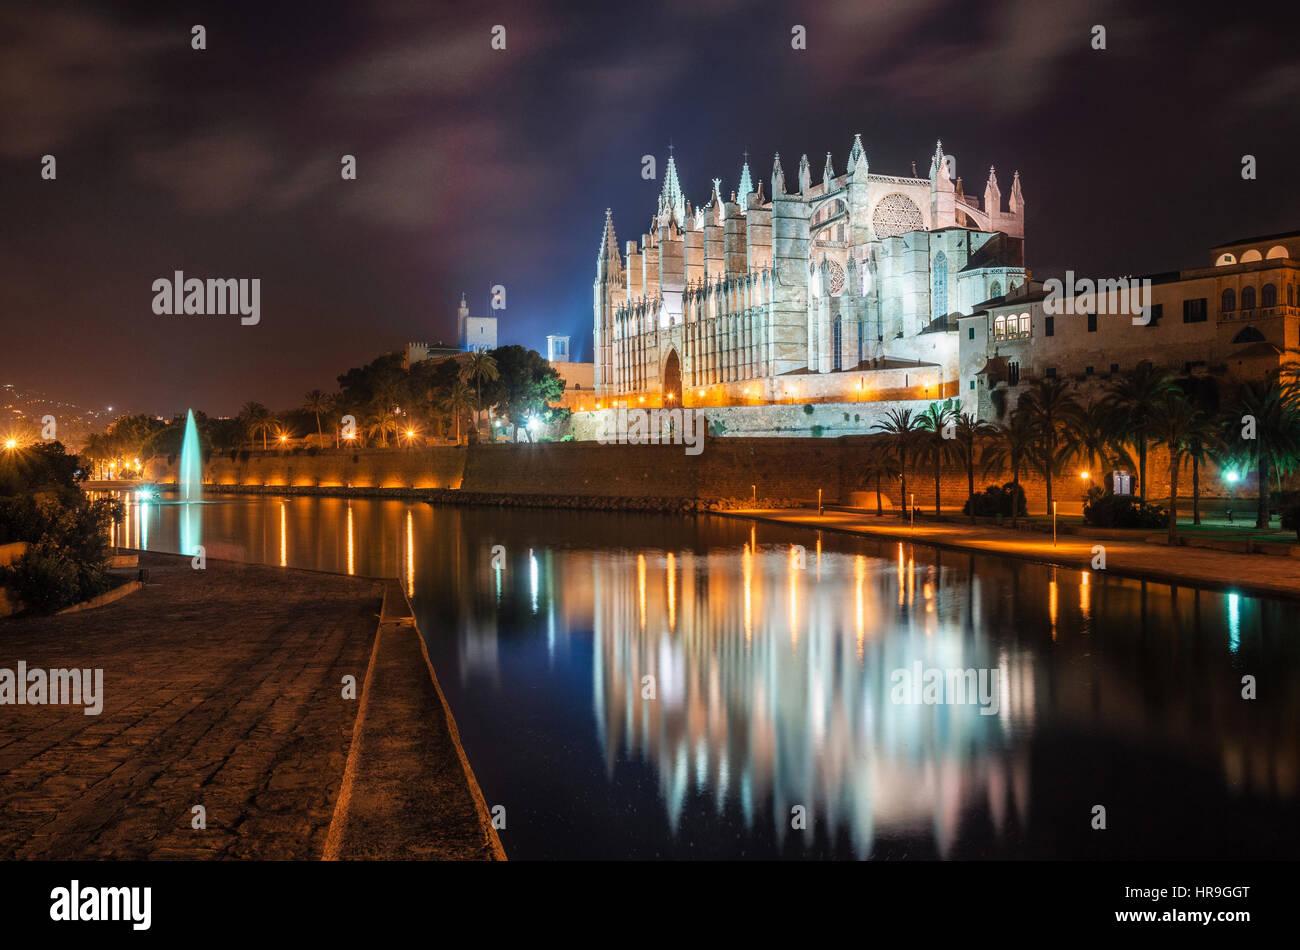 Palma de Mallorca, Spain - May 27, 2016: La Seu, the gothic medieval cathedral of Palma de Mallorca at the night - Stock Image